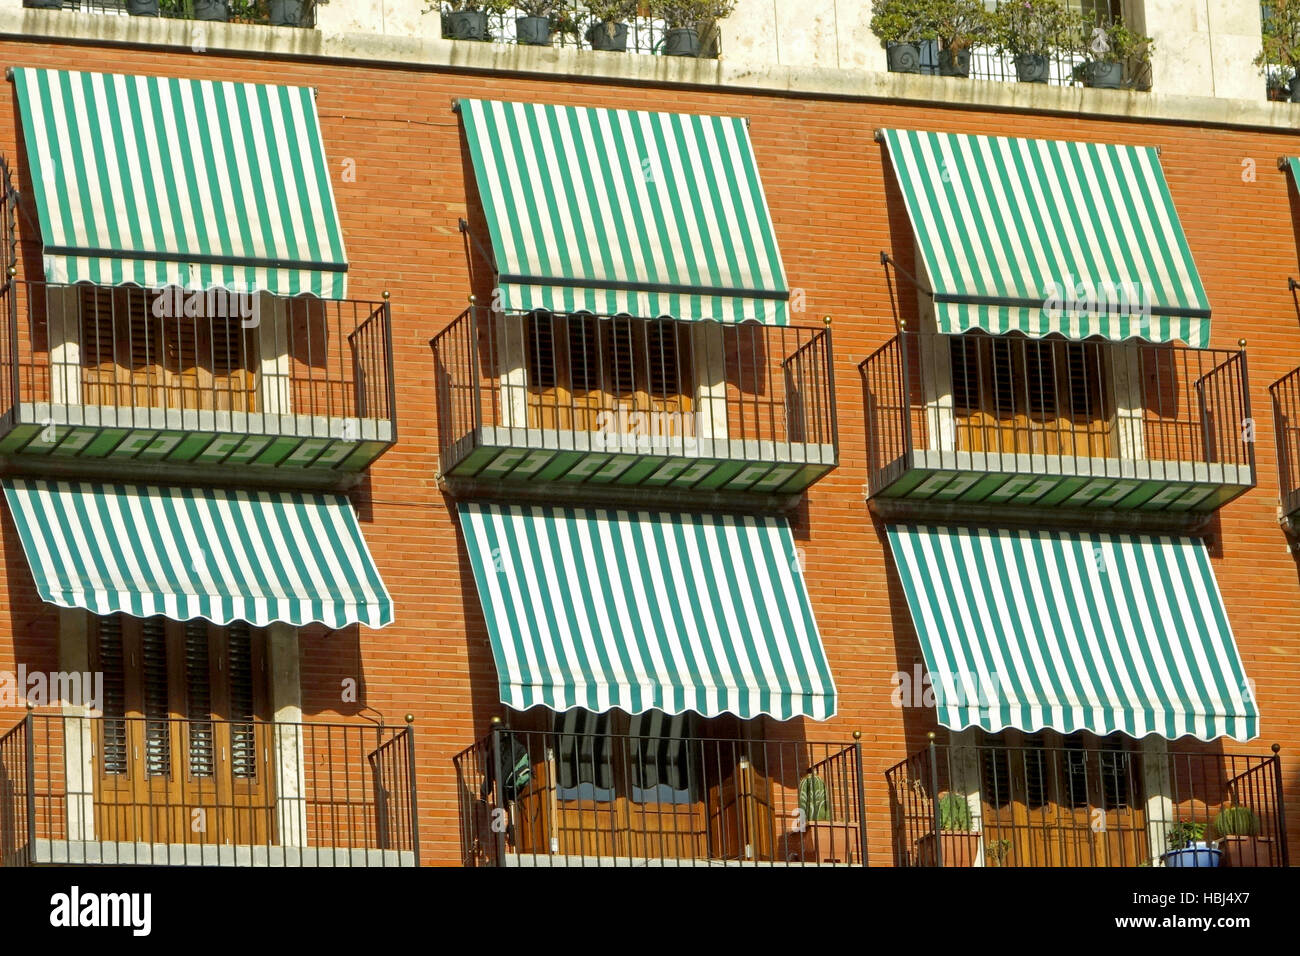 Awnings stockfotos awnings bilder alamy for Haus in spanien